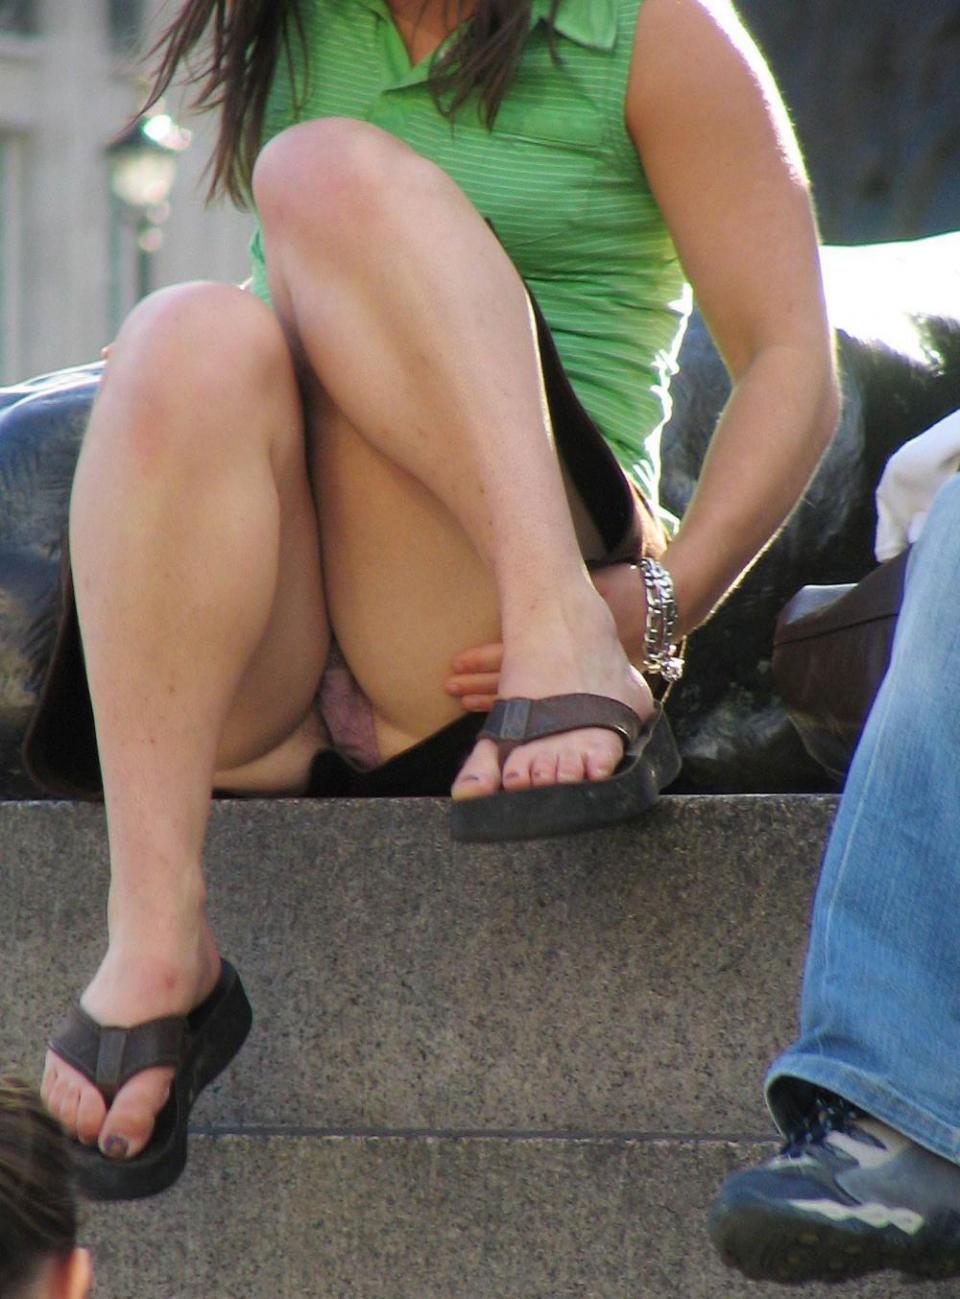 voyeur schoolgirl upskirt